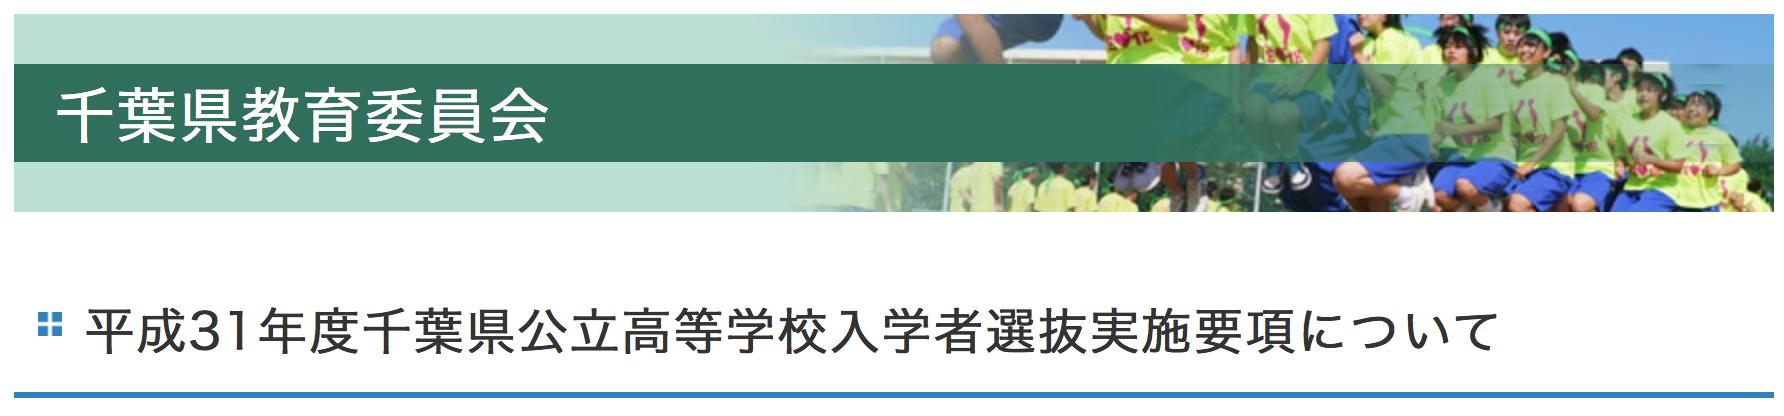 平成31年度千葉県公立高等学校入学者選抜実施要項について